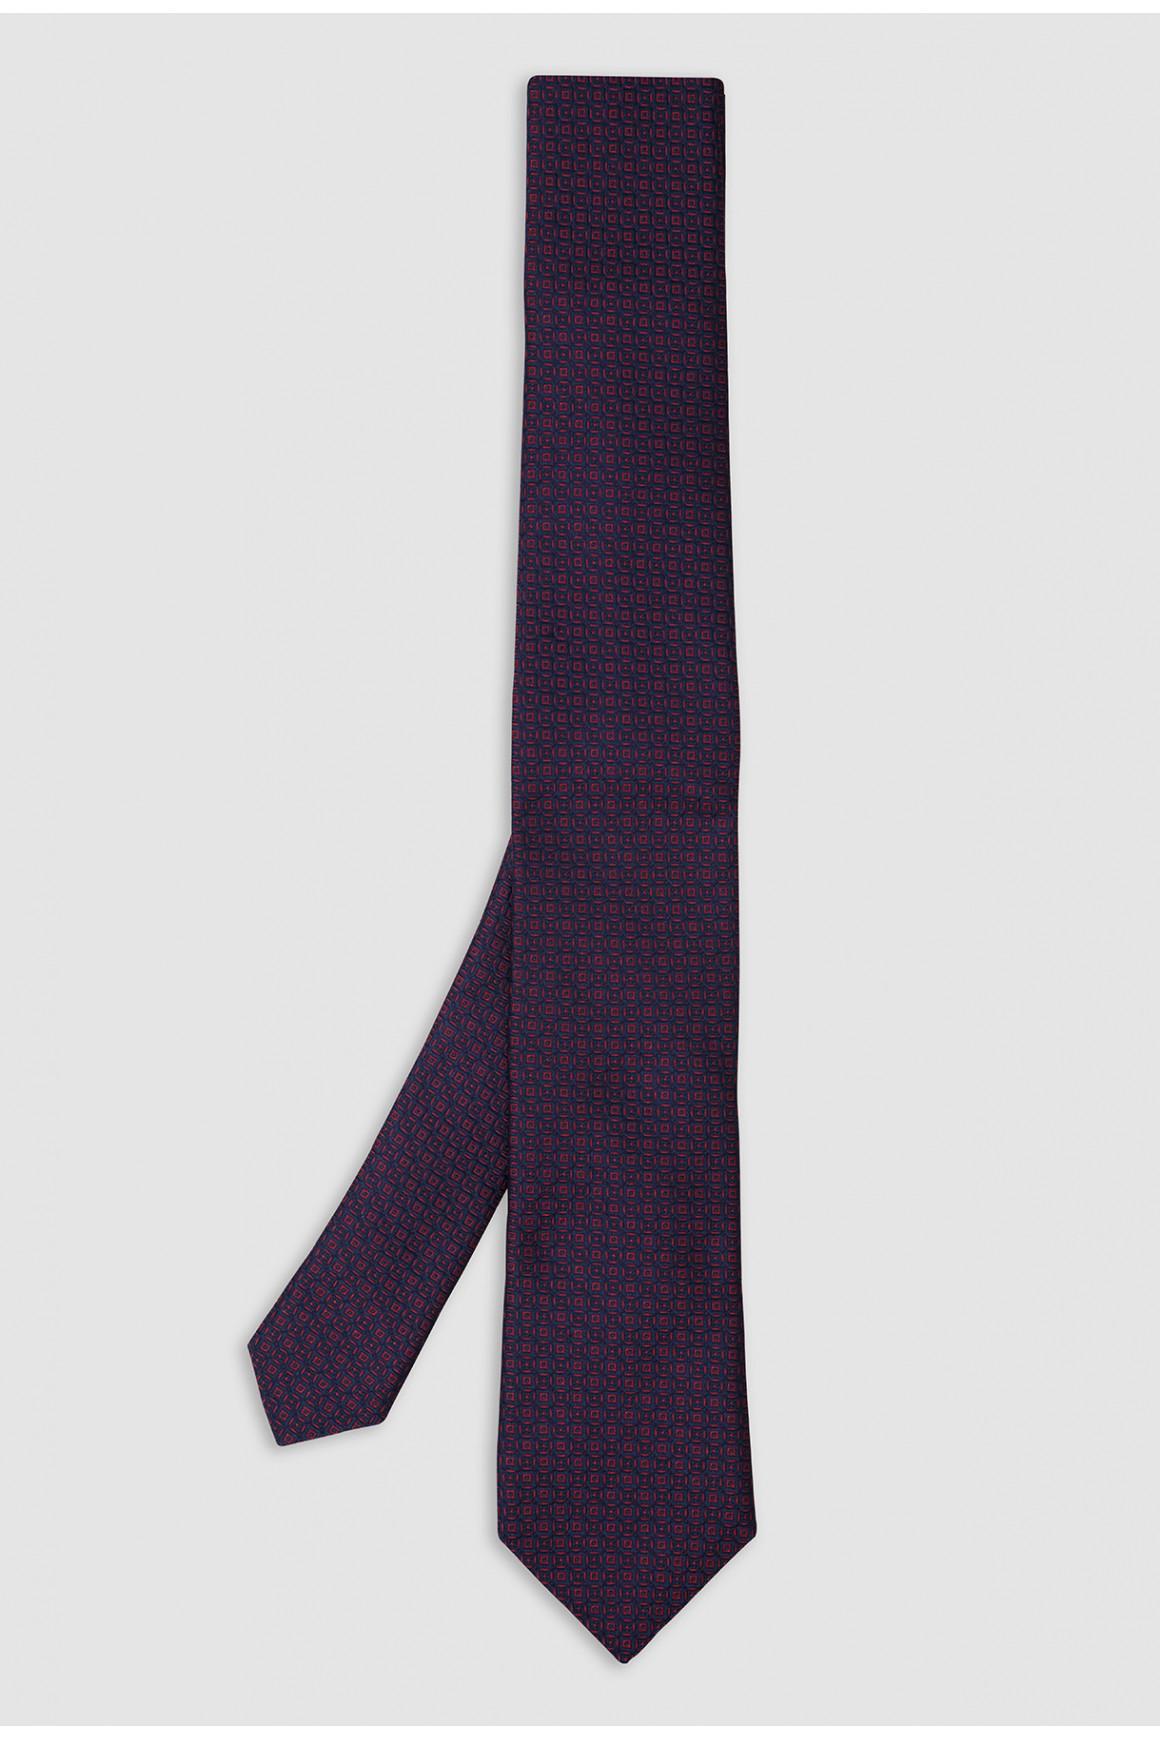 Cravate Navy Micromotif Soie